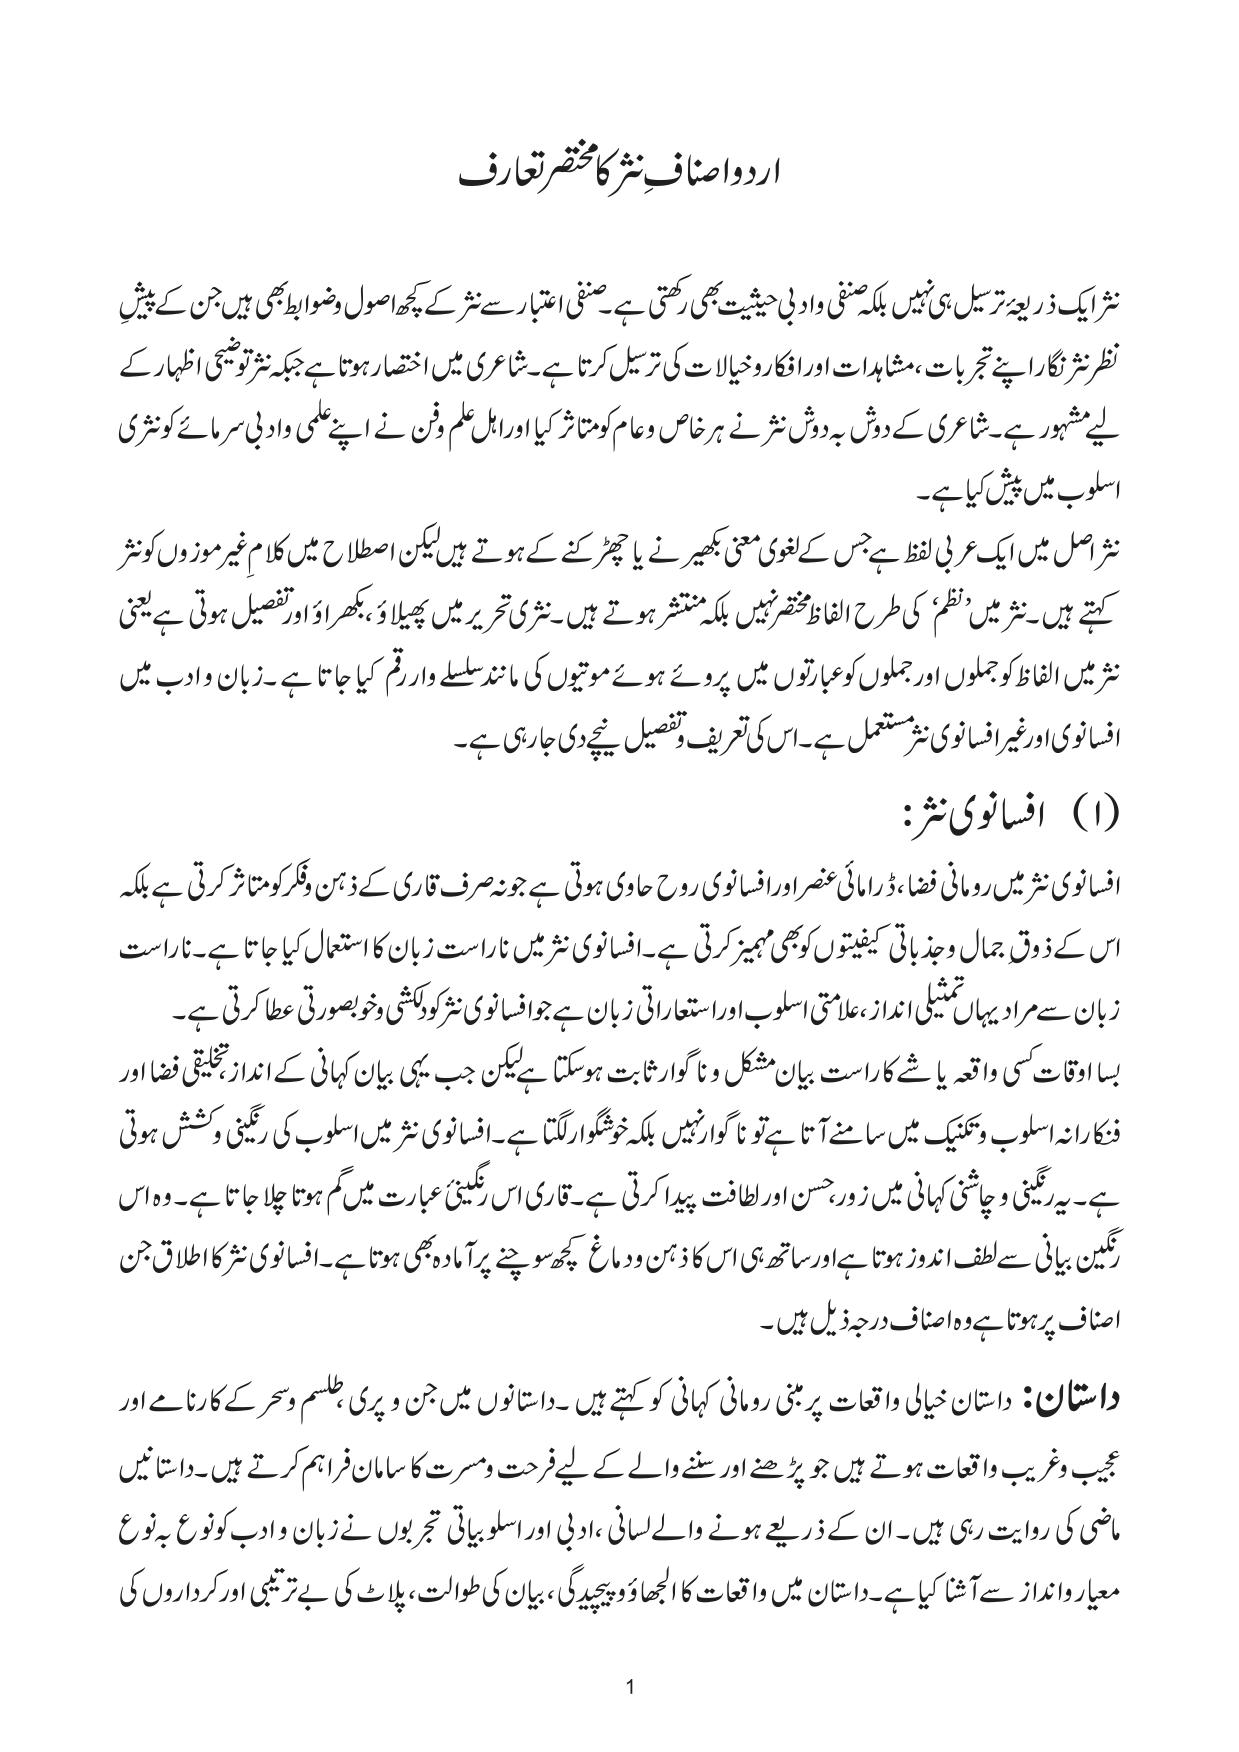 اردو اصناف نثر کا مختصر تعارف A Brief Introduction To Urdu Prose